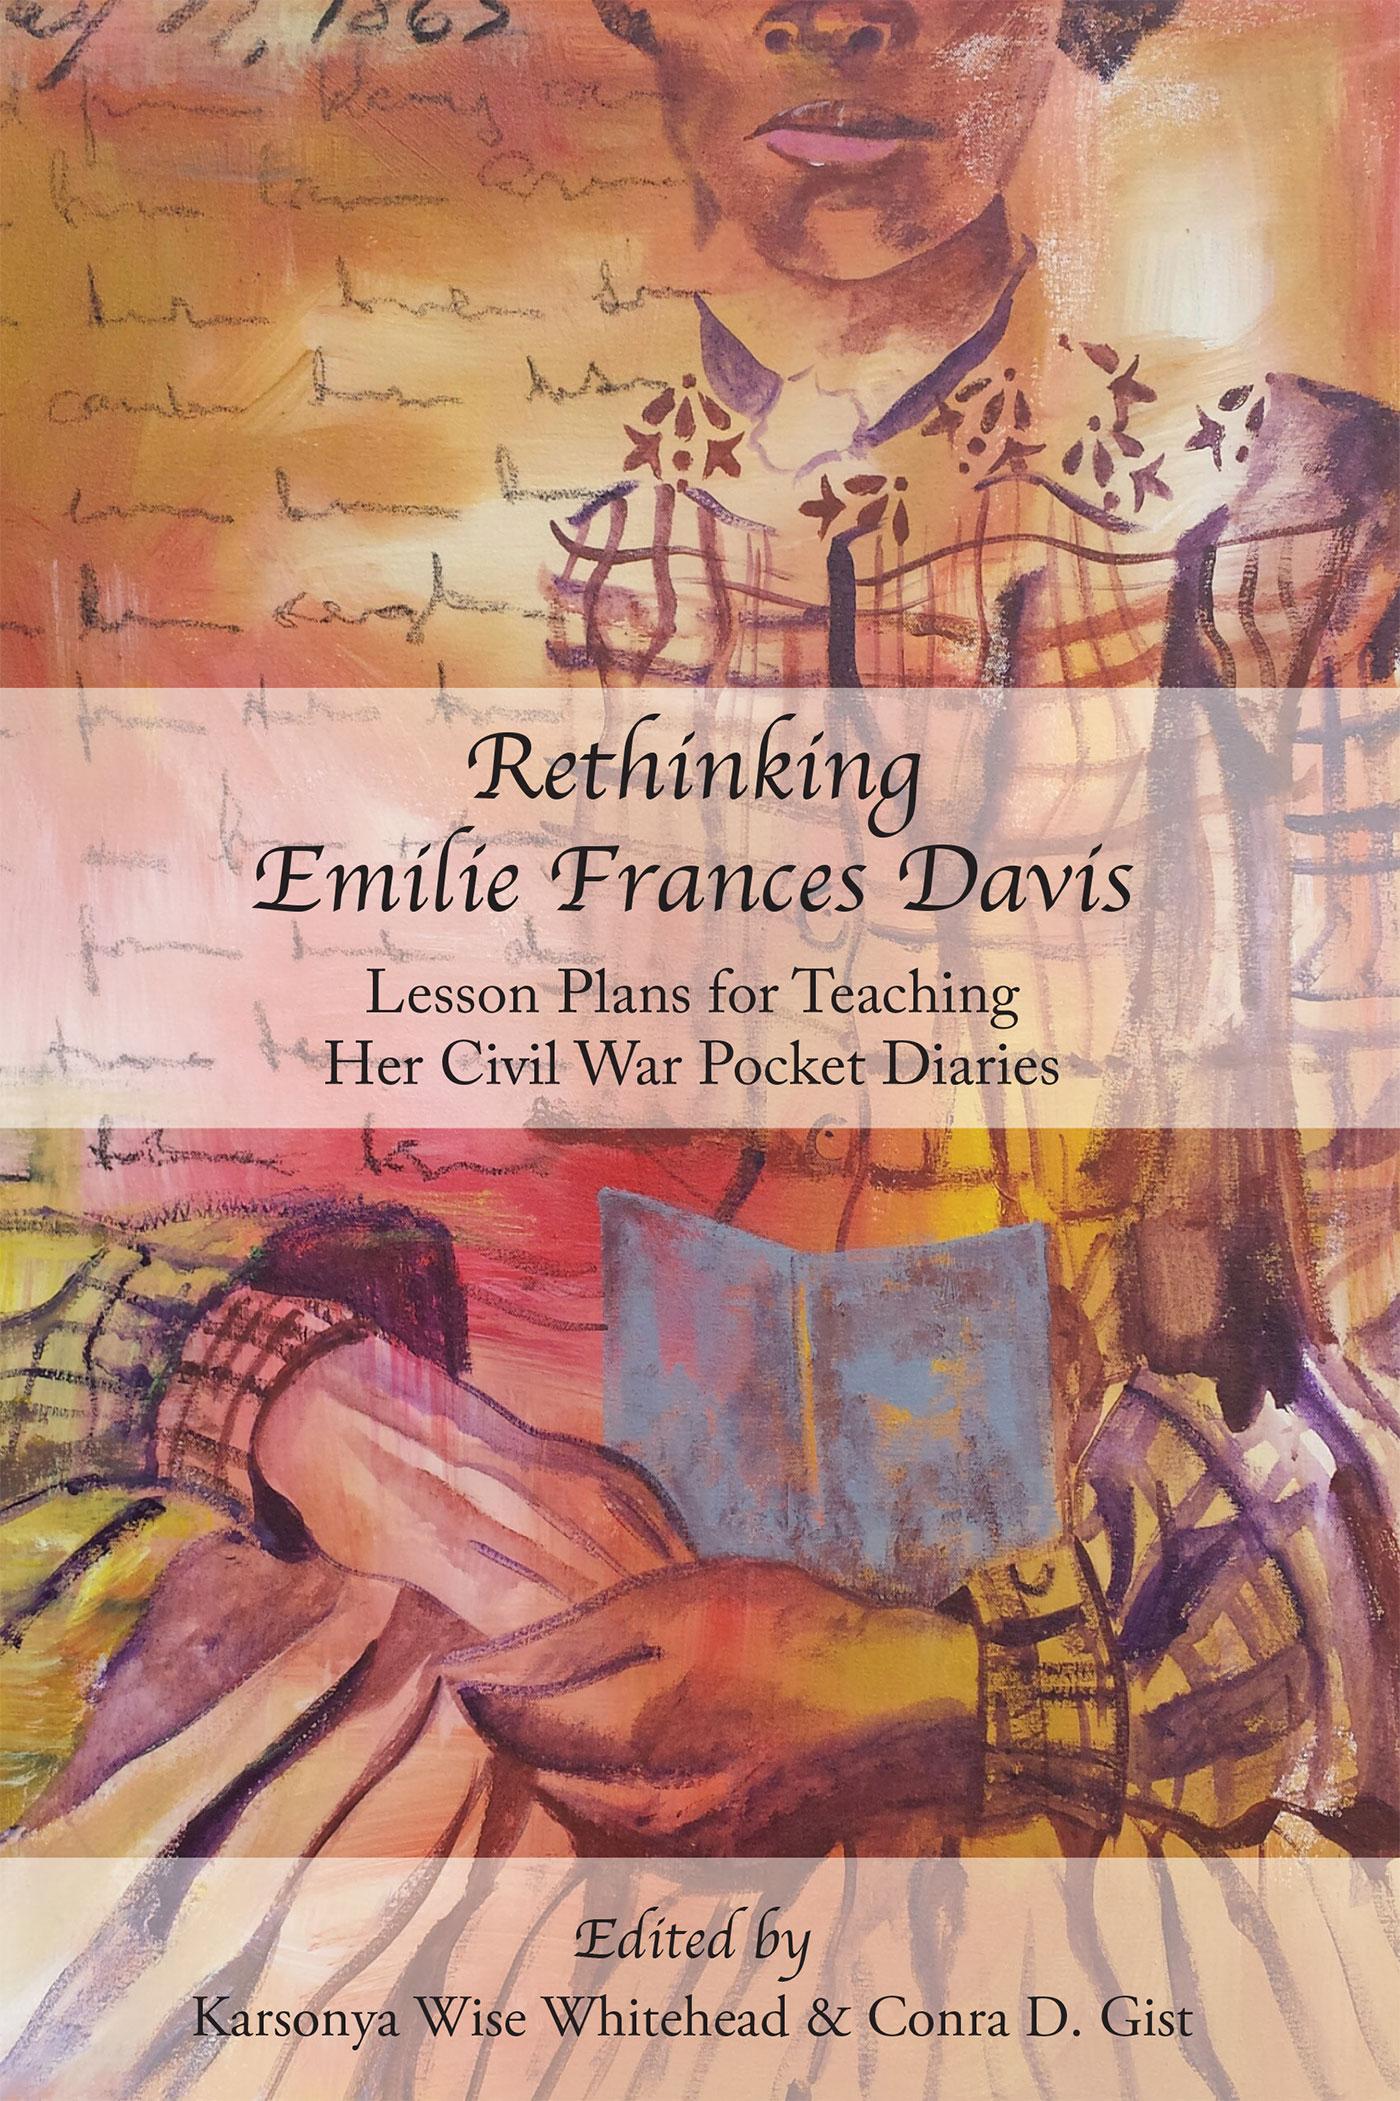 Rethinking Emilie Frances Davis Lesson Plans For Teaching Her Civil War Pocket Diaries